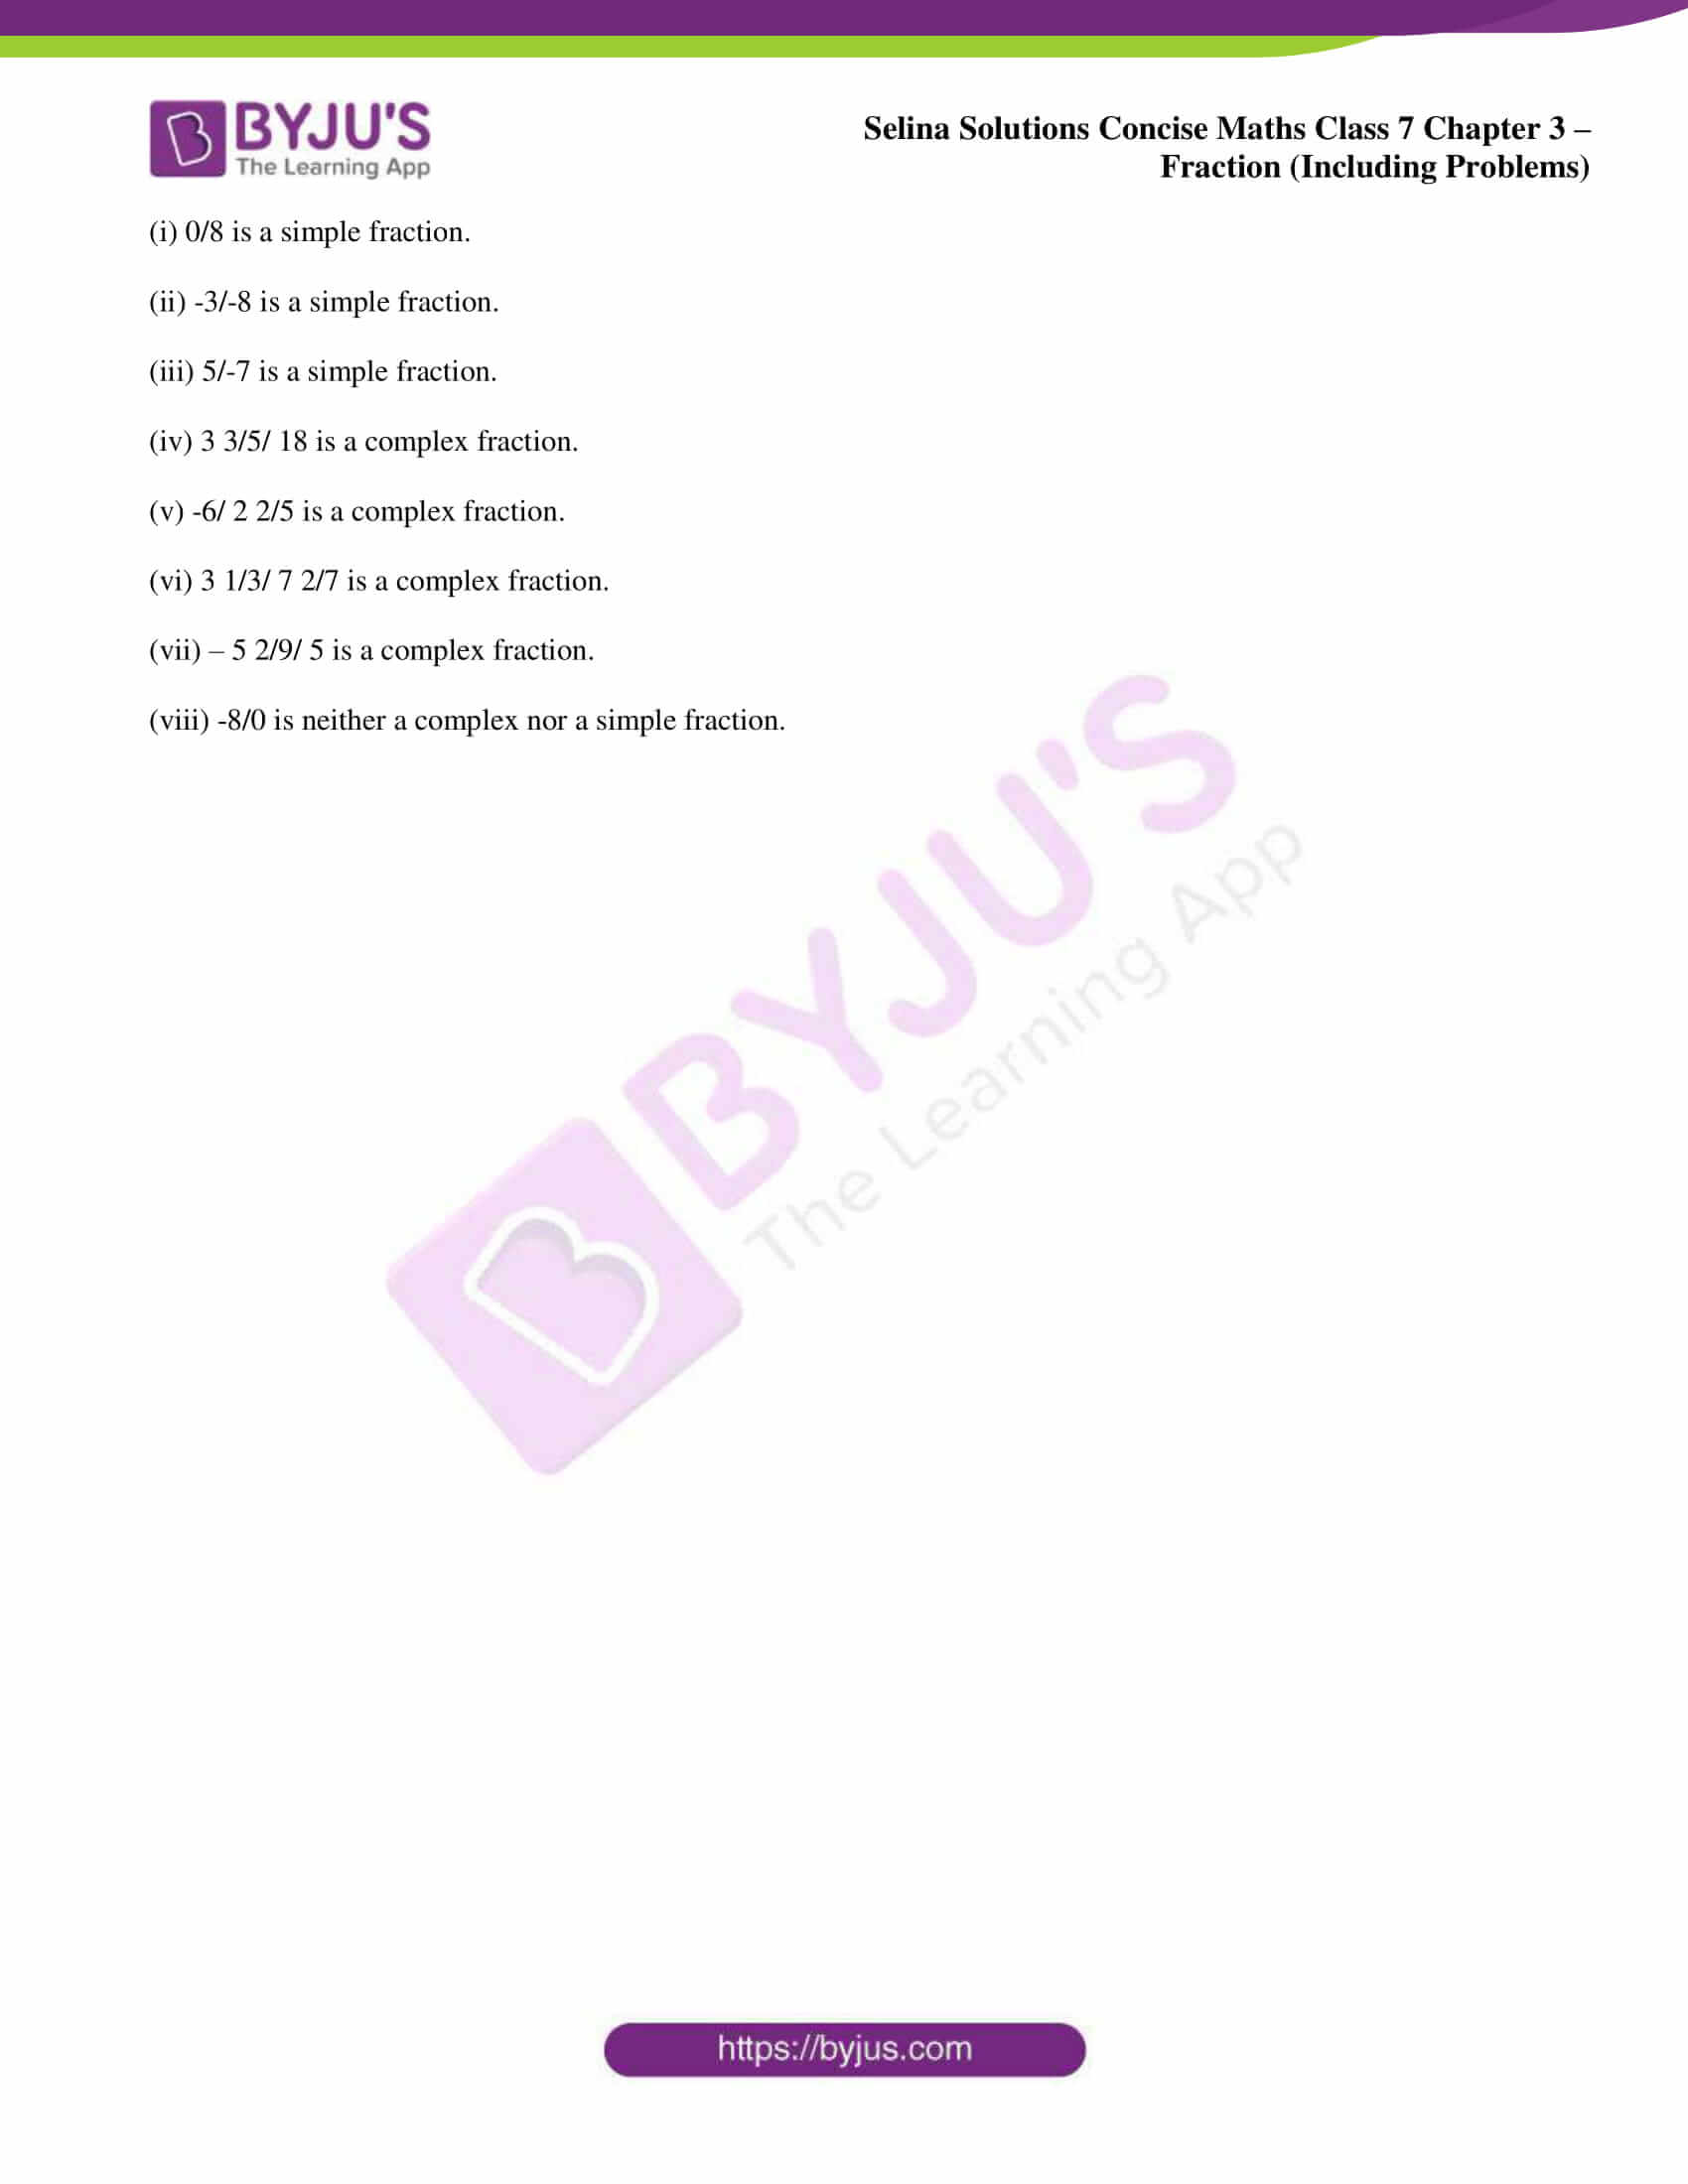 selina sol concise maths class 7 ch3 ex 3a 4